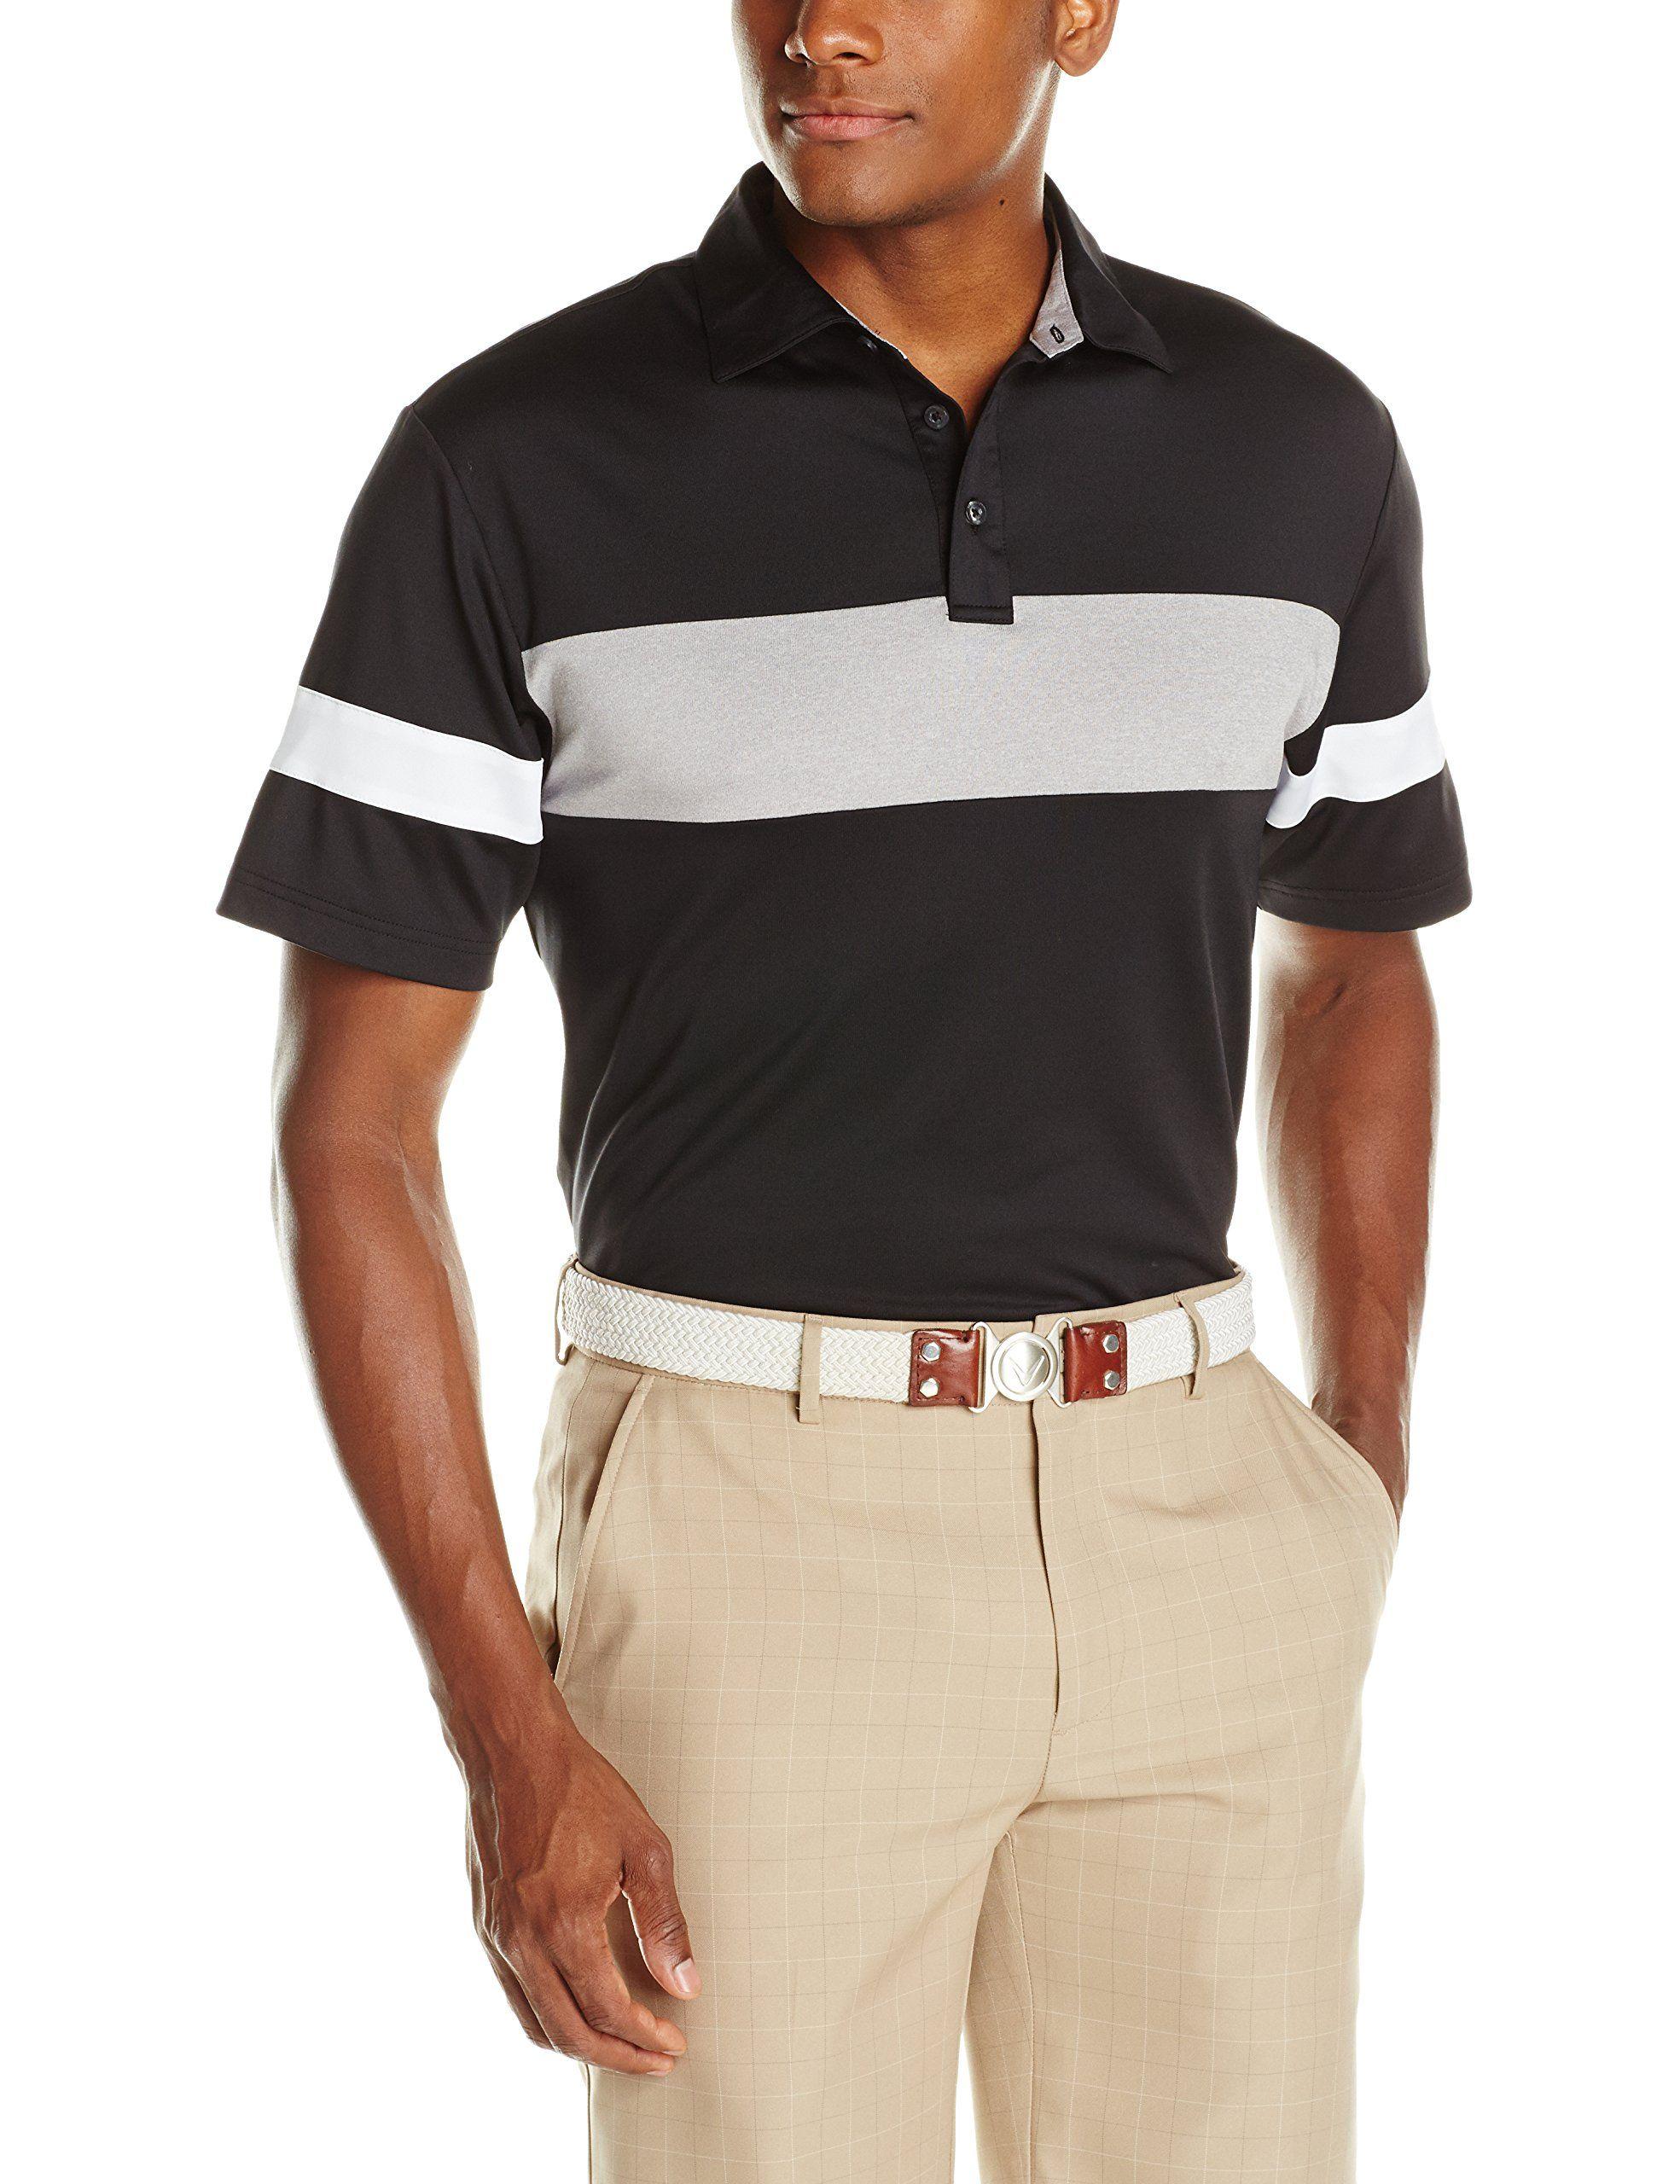 hogan golf apparel